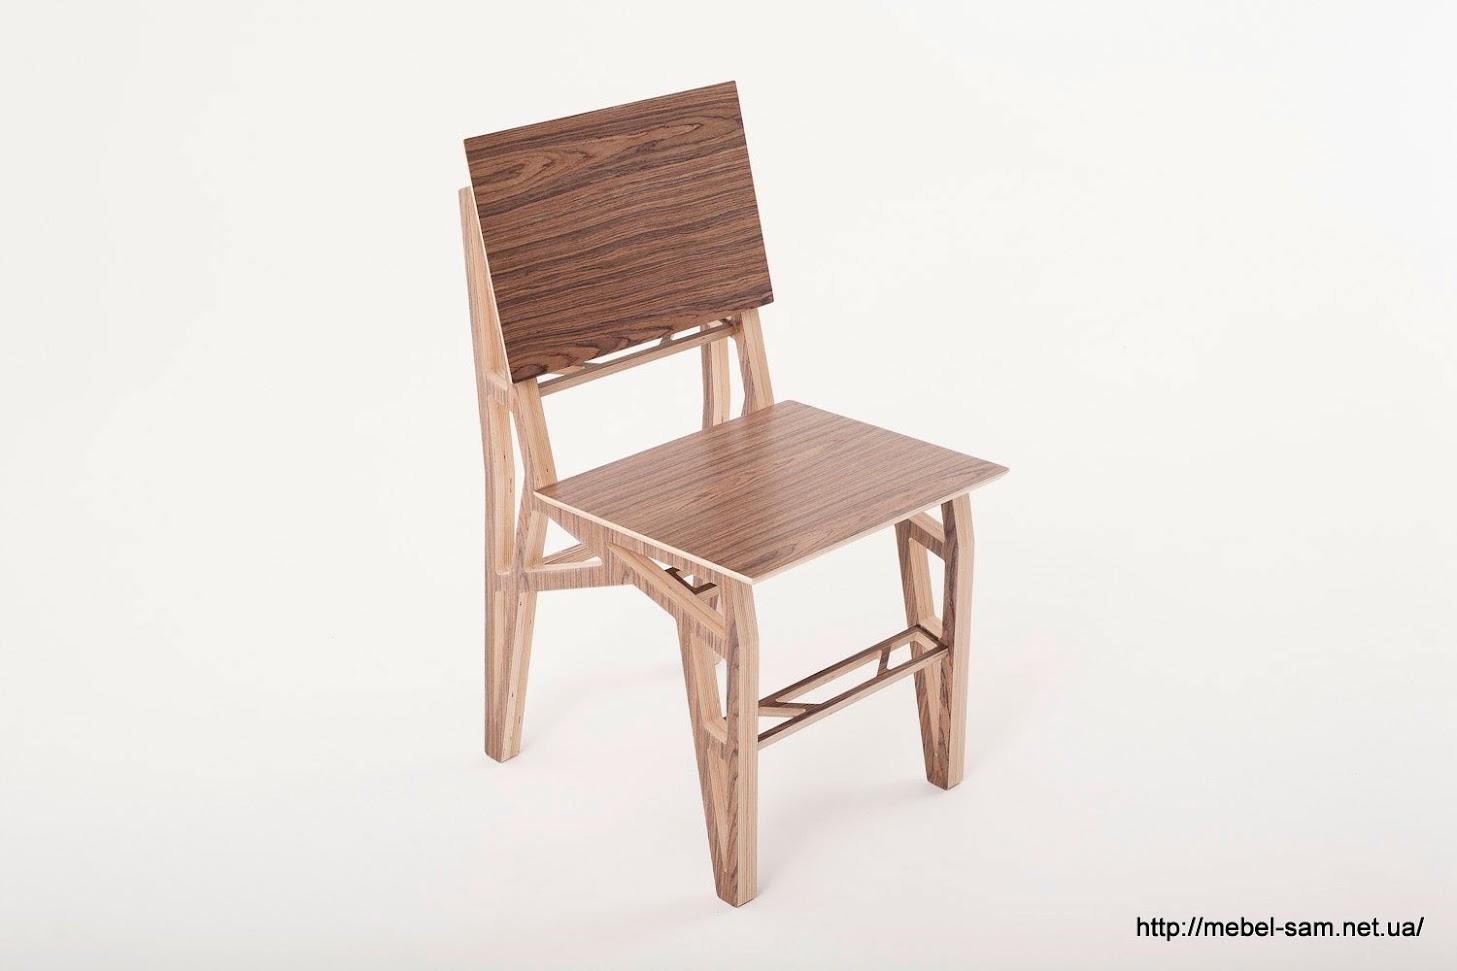 Общий вид стула